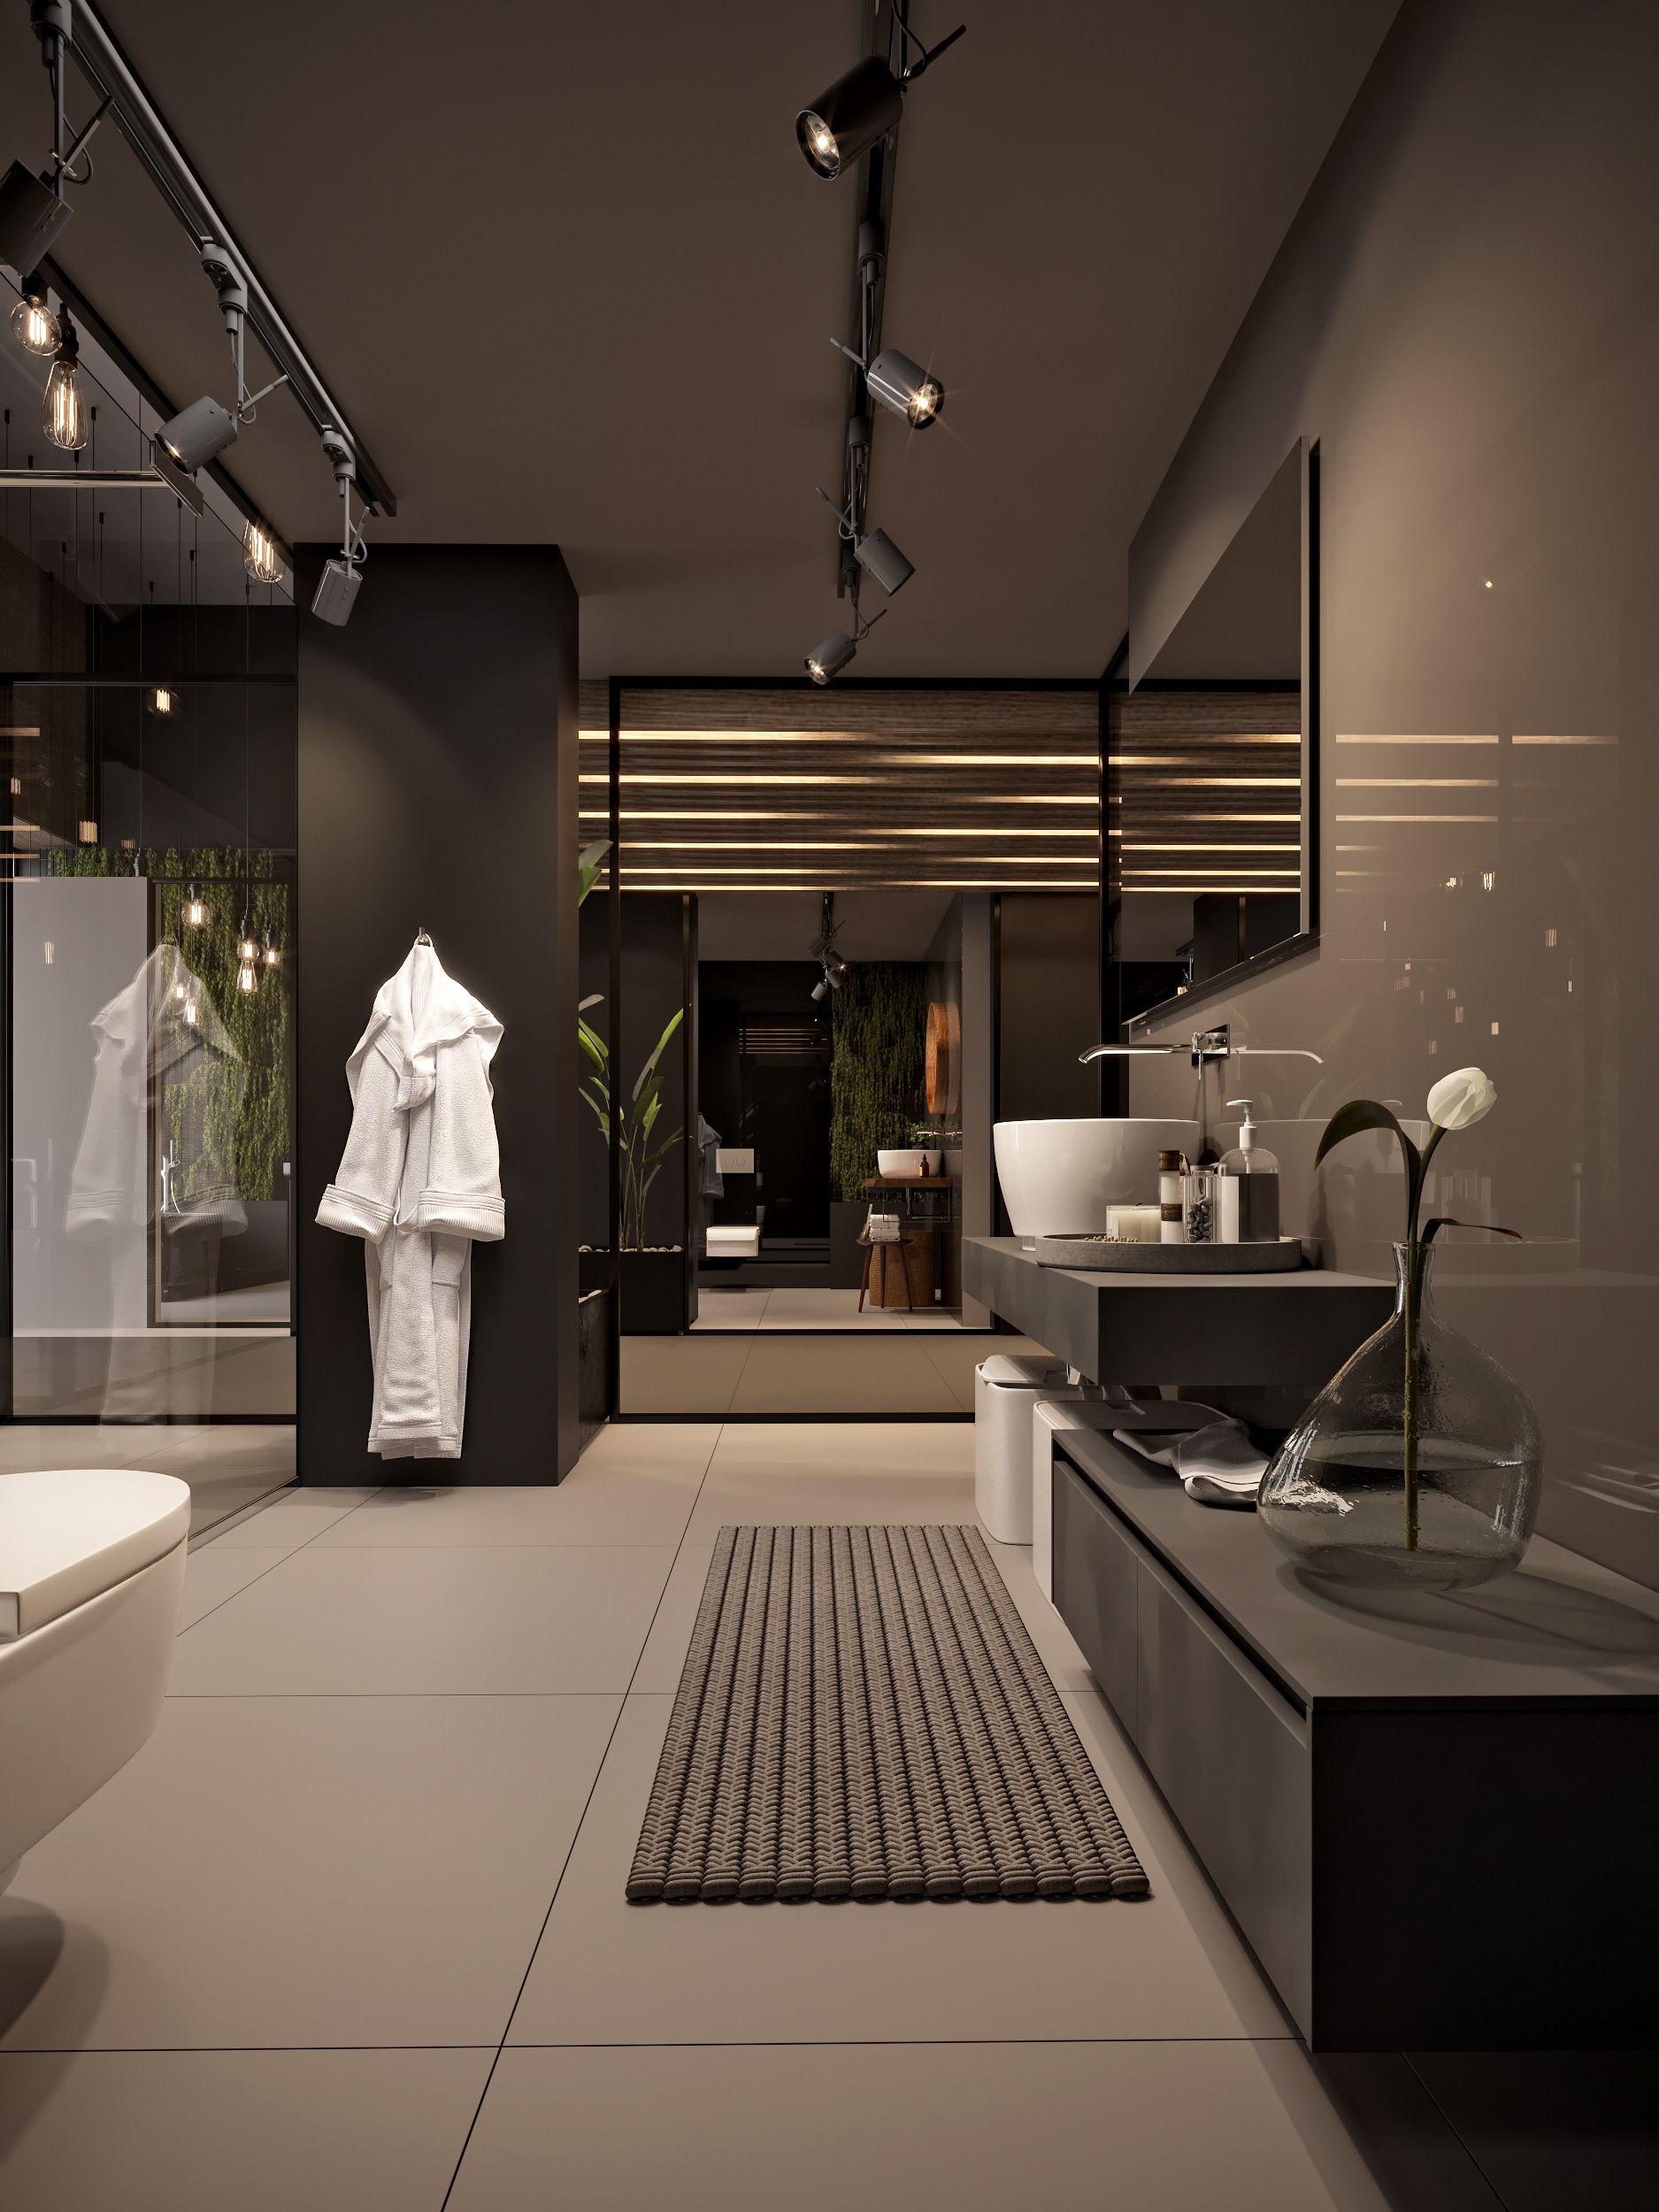 Bathroom Showroom Design By M Serhat Sezgin Dream House Decor Dream House Interior Mansion Interior